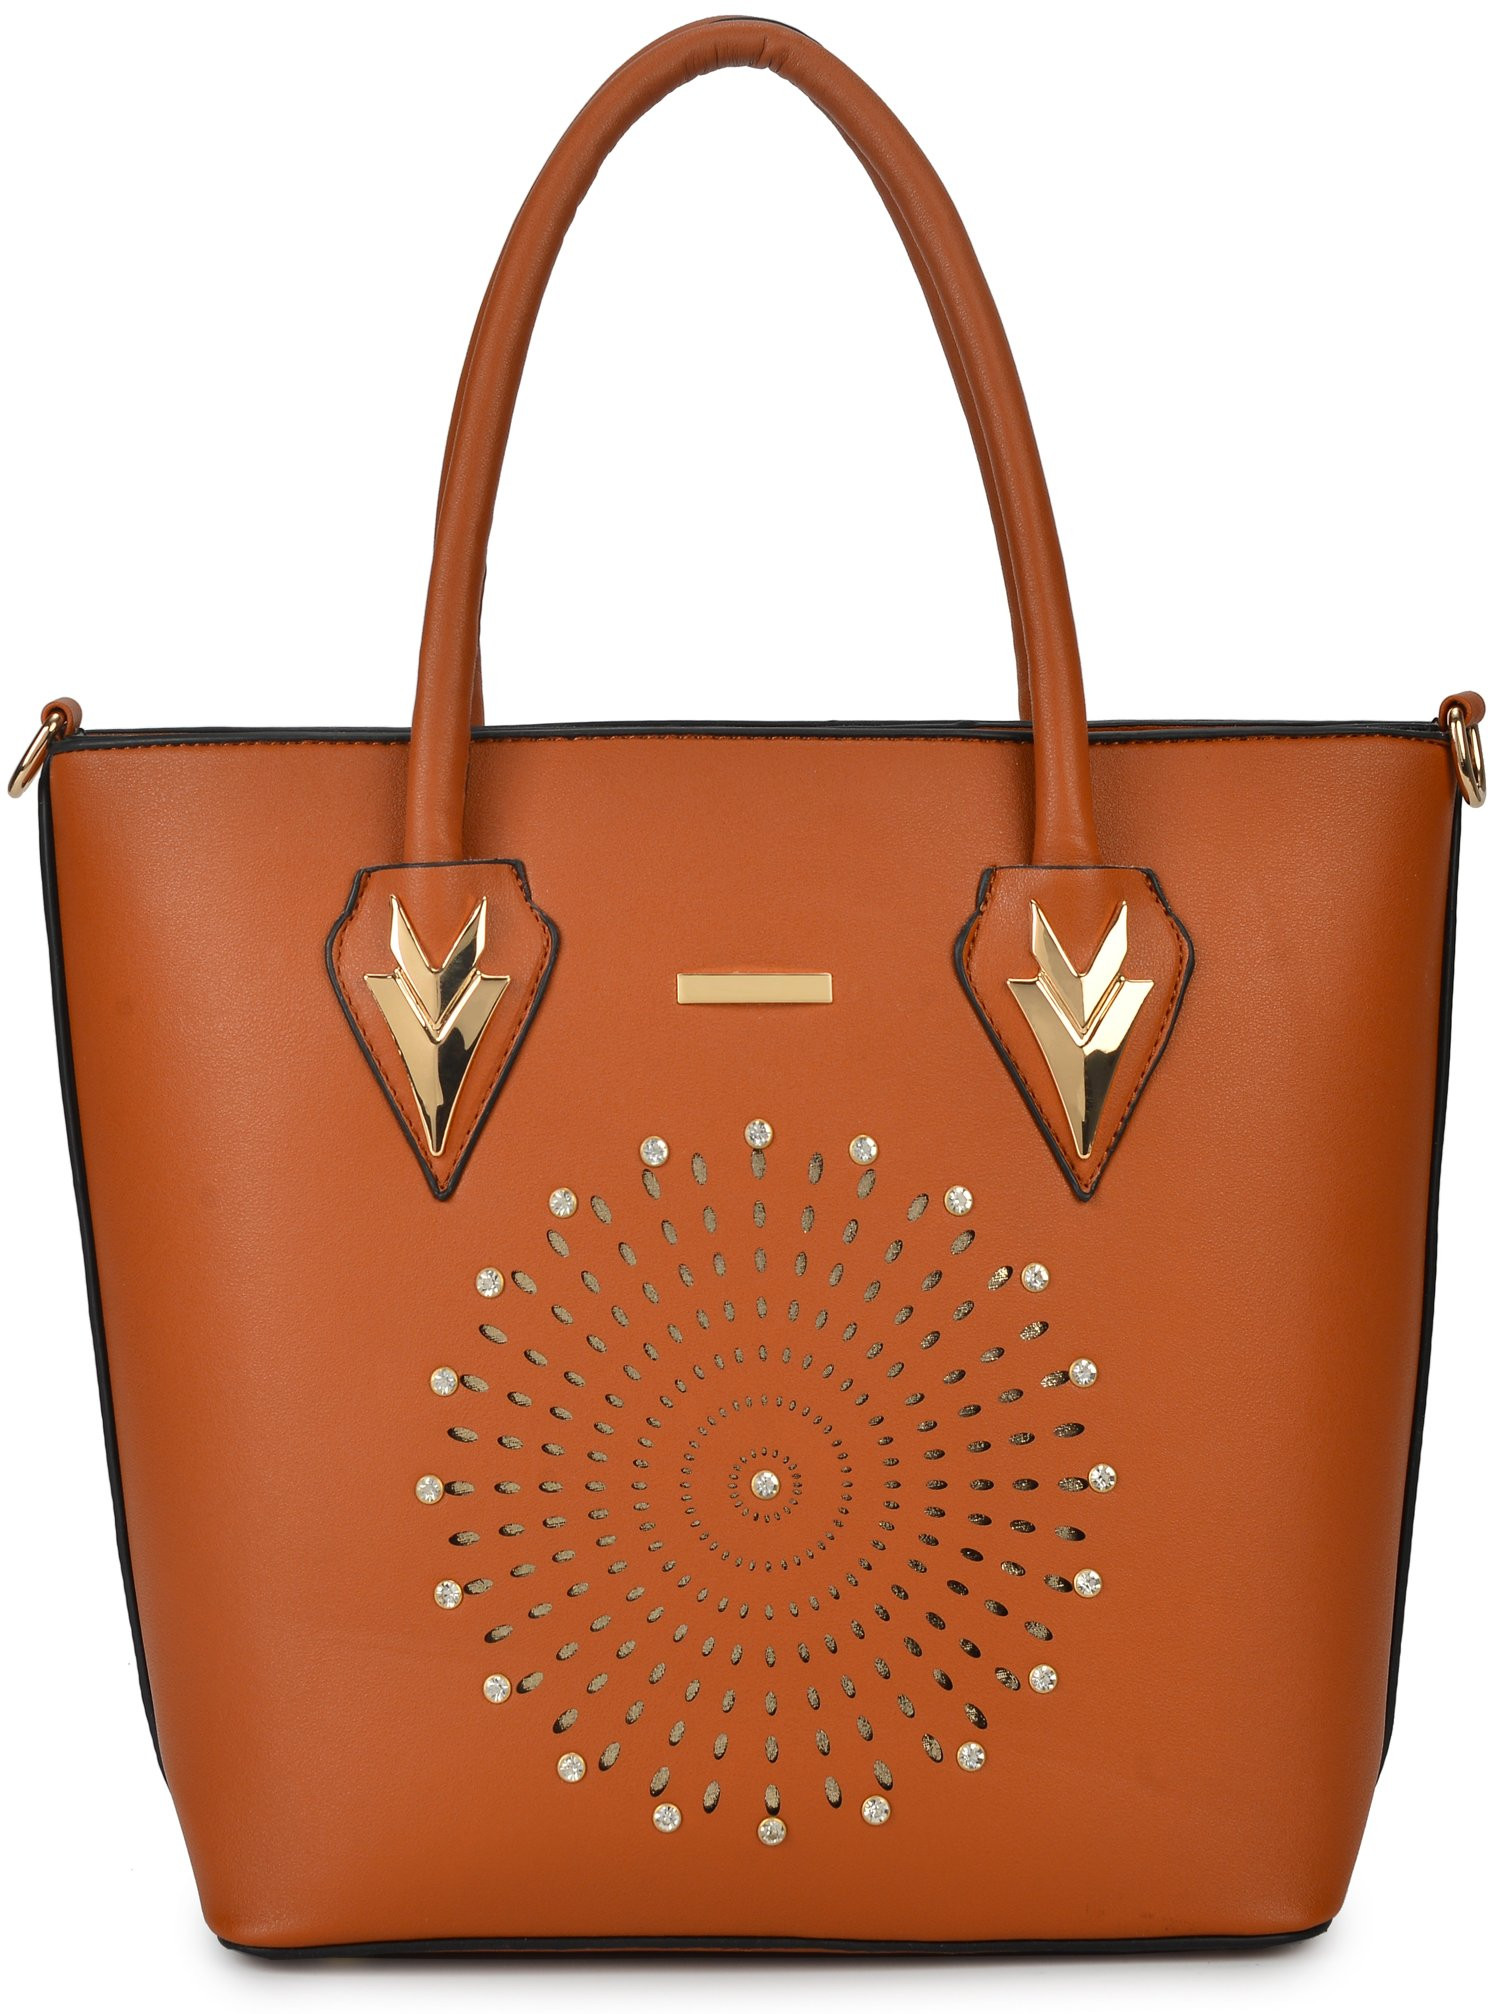 Women Handbag Purse Hobo Faux Leather Messenger Bag Clutch Satchel Bag 3 Piece Gift Set by KasPala (Image #2)